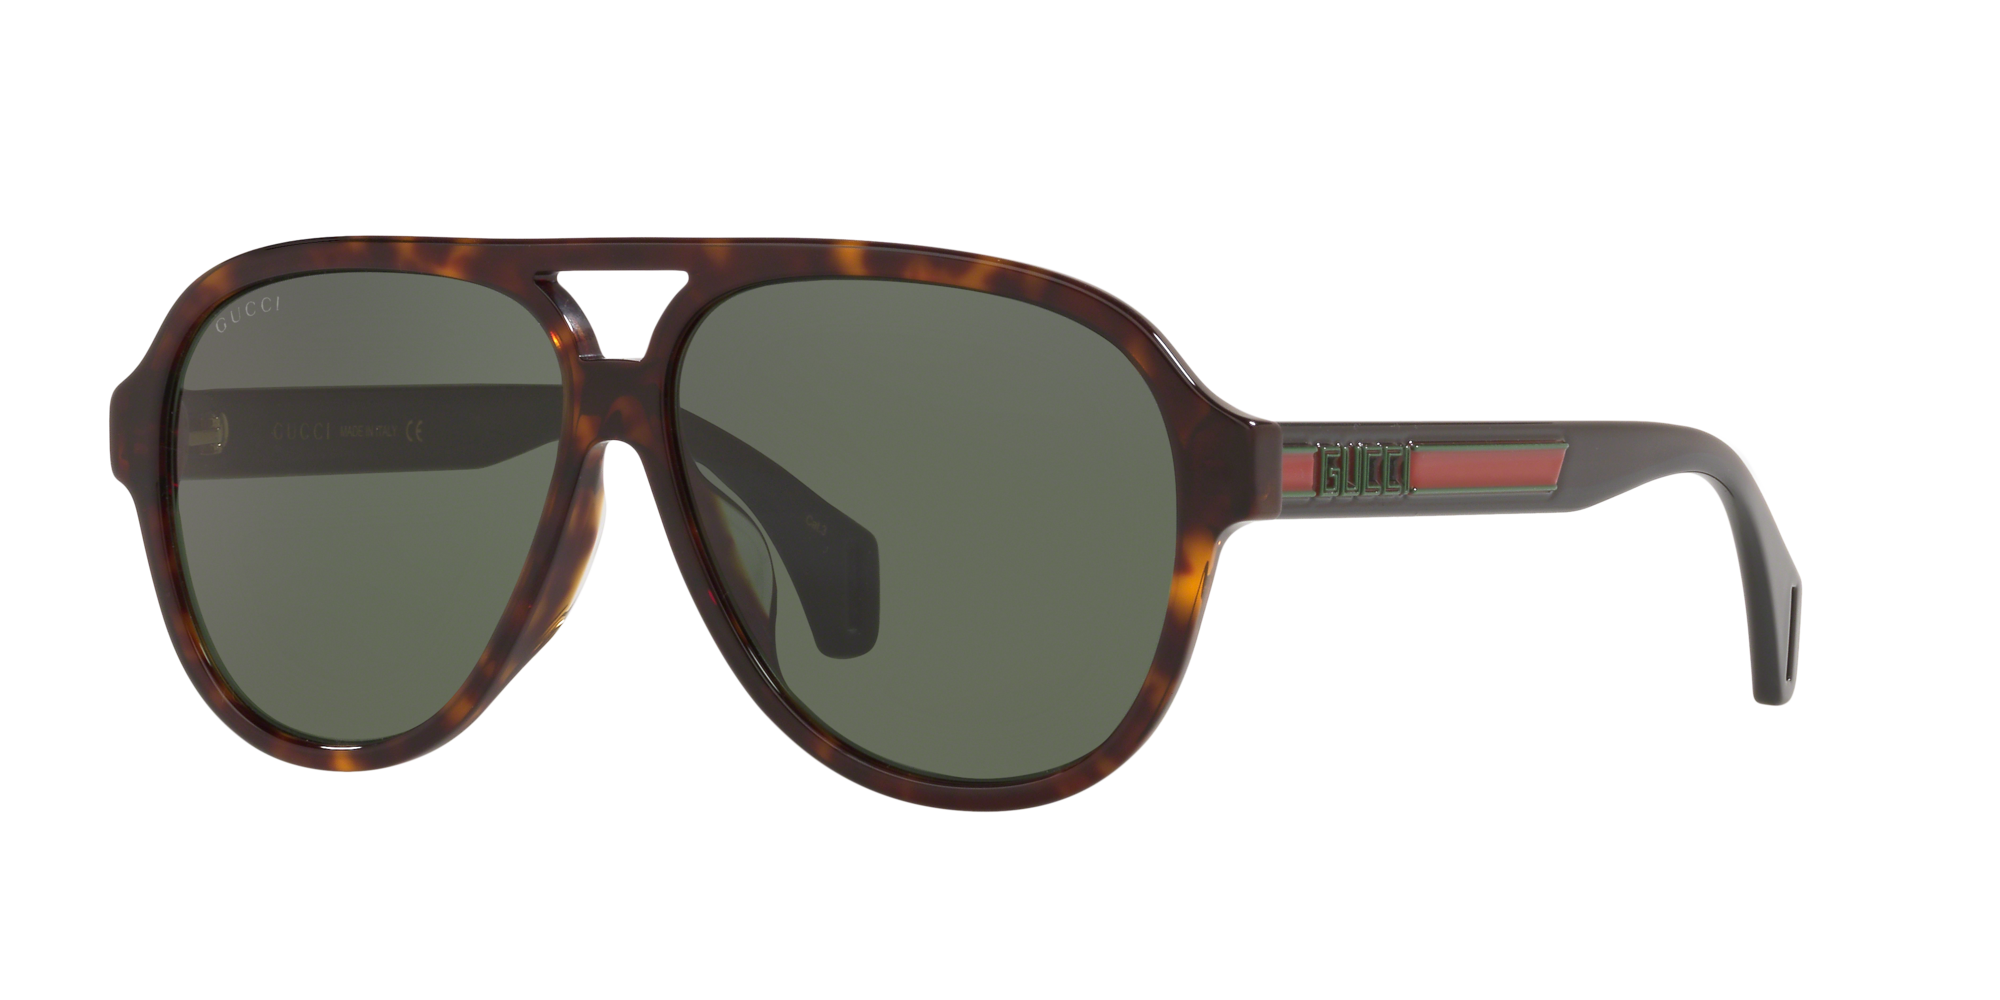 Gucci Unisex  GC001216 -  Frame color: Habana, Lens color: Verde